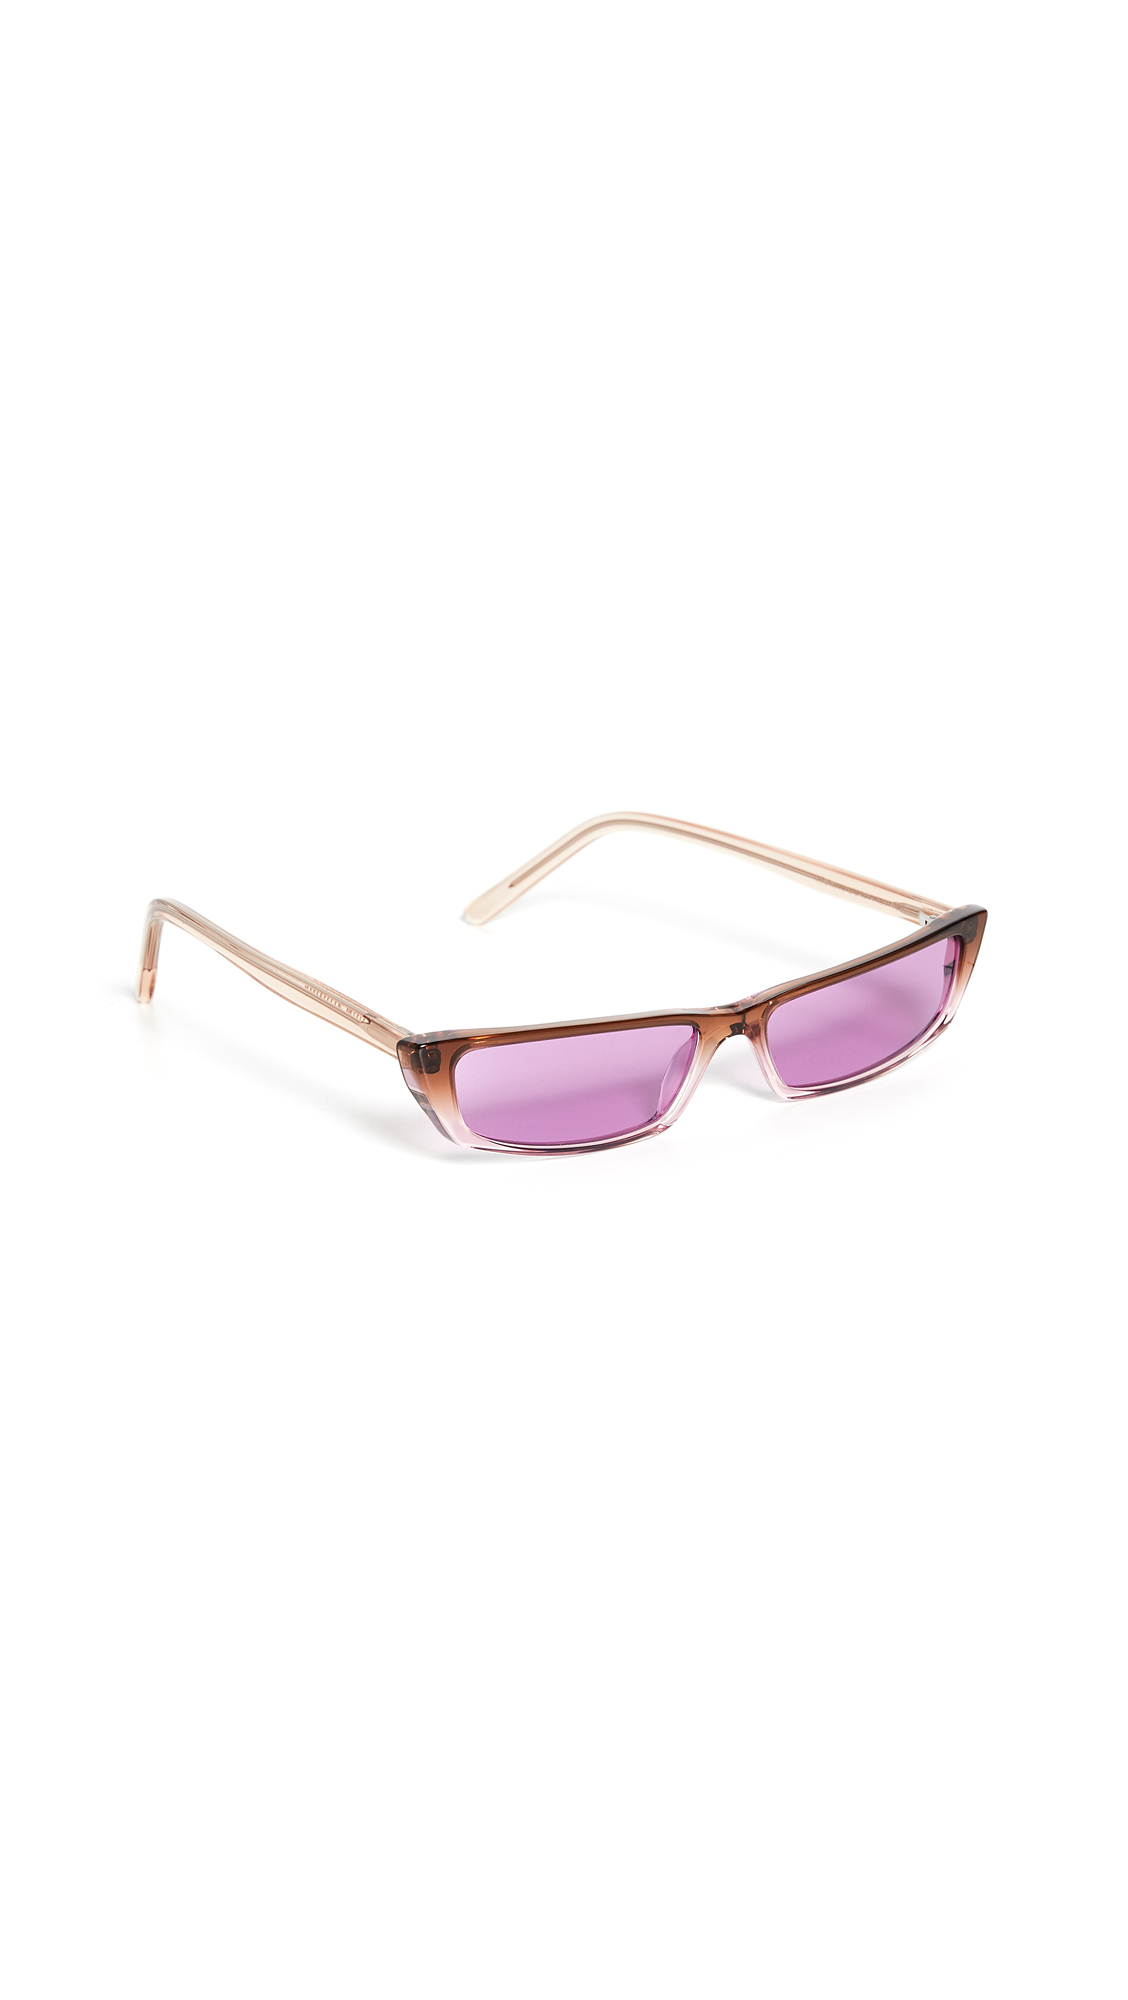 Acne Studios Agar Eyewear - Brown/Purple